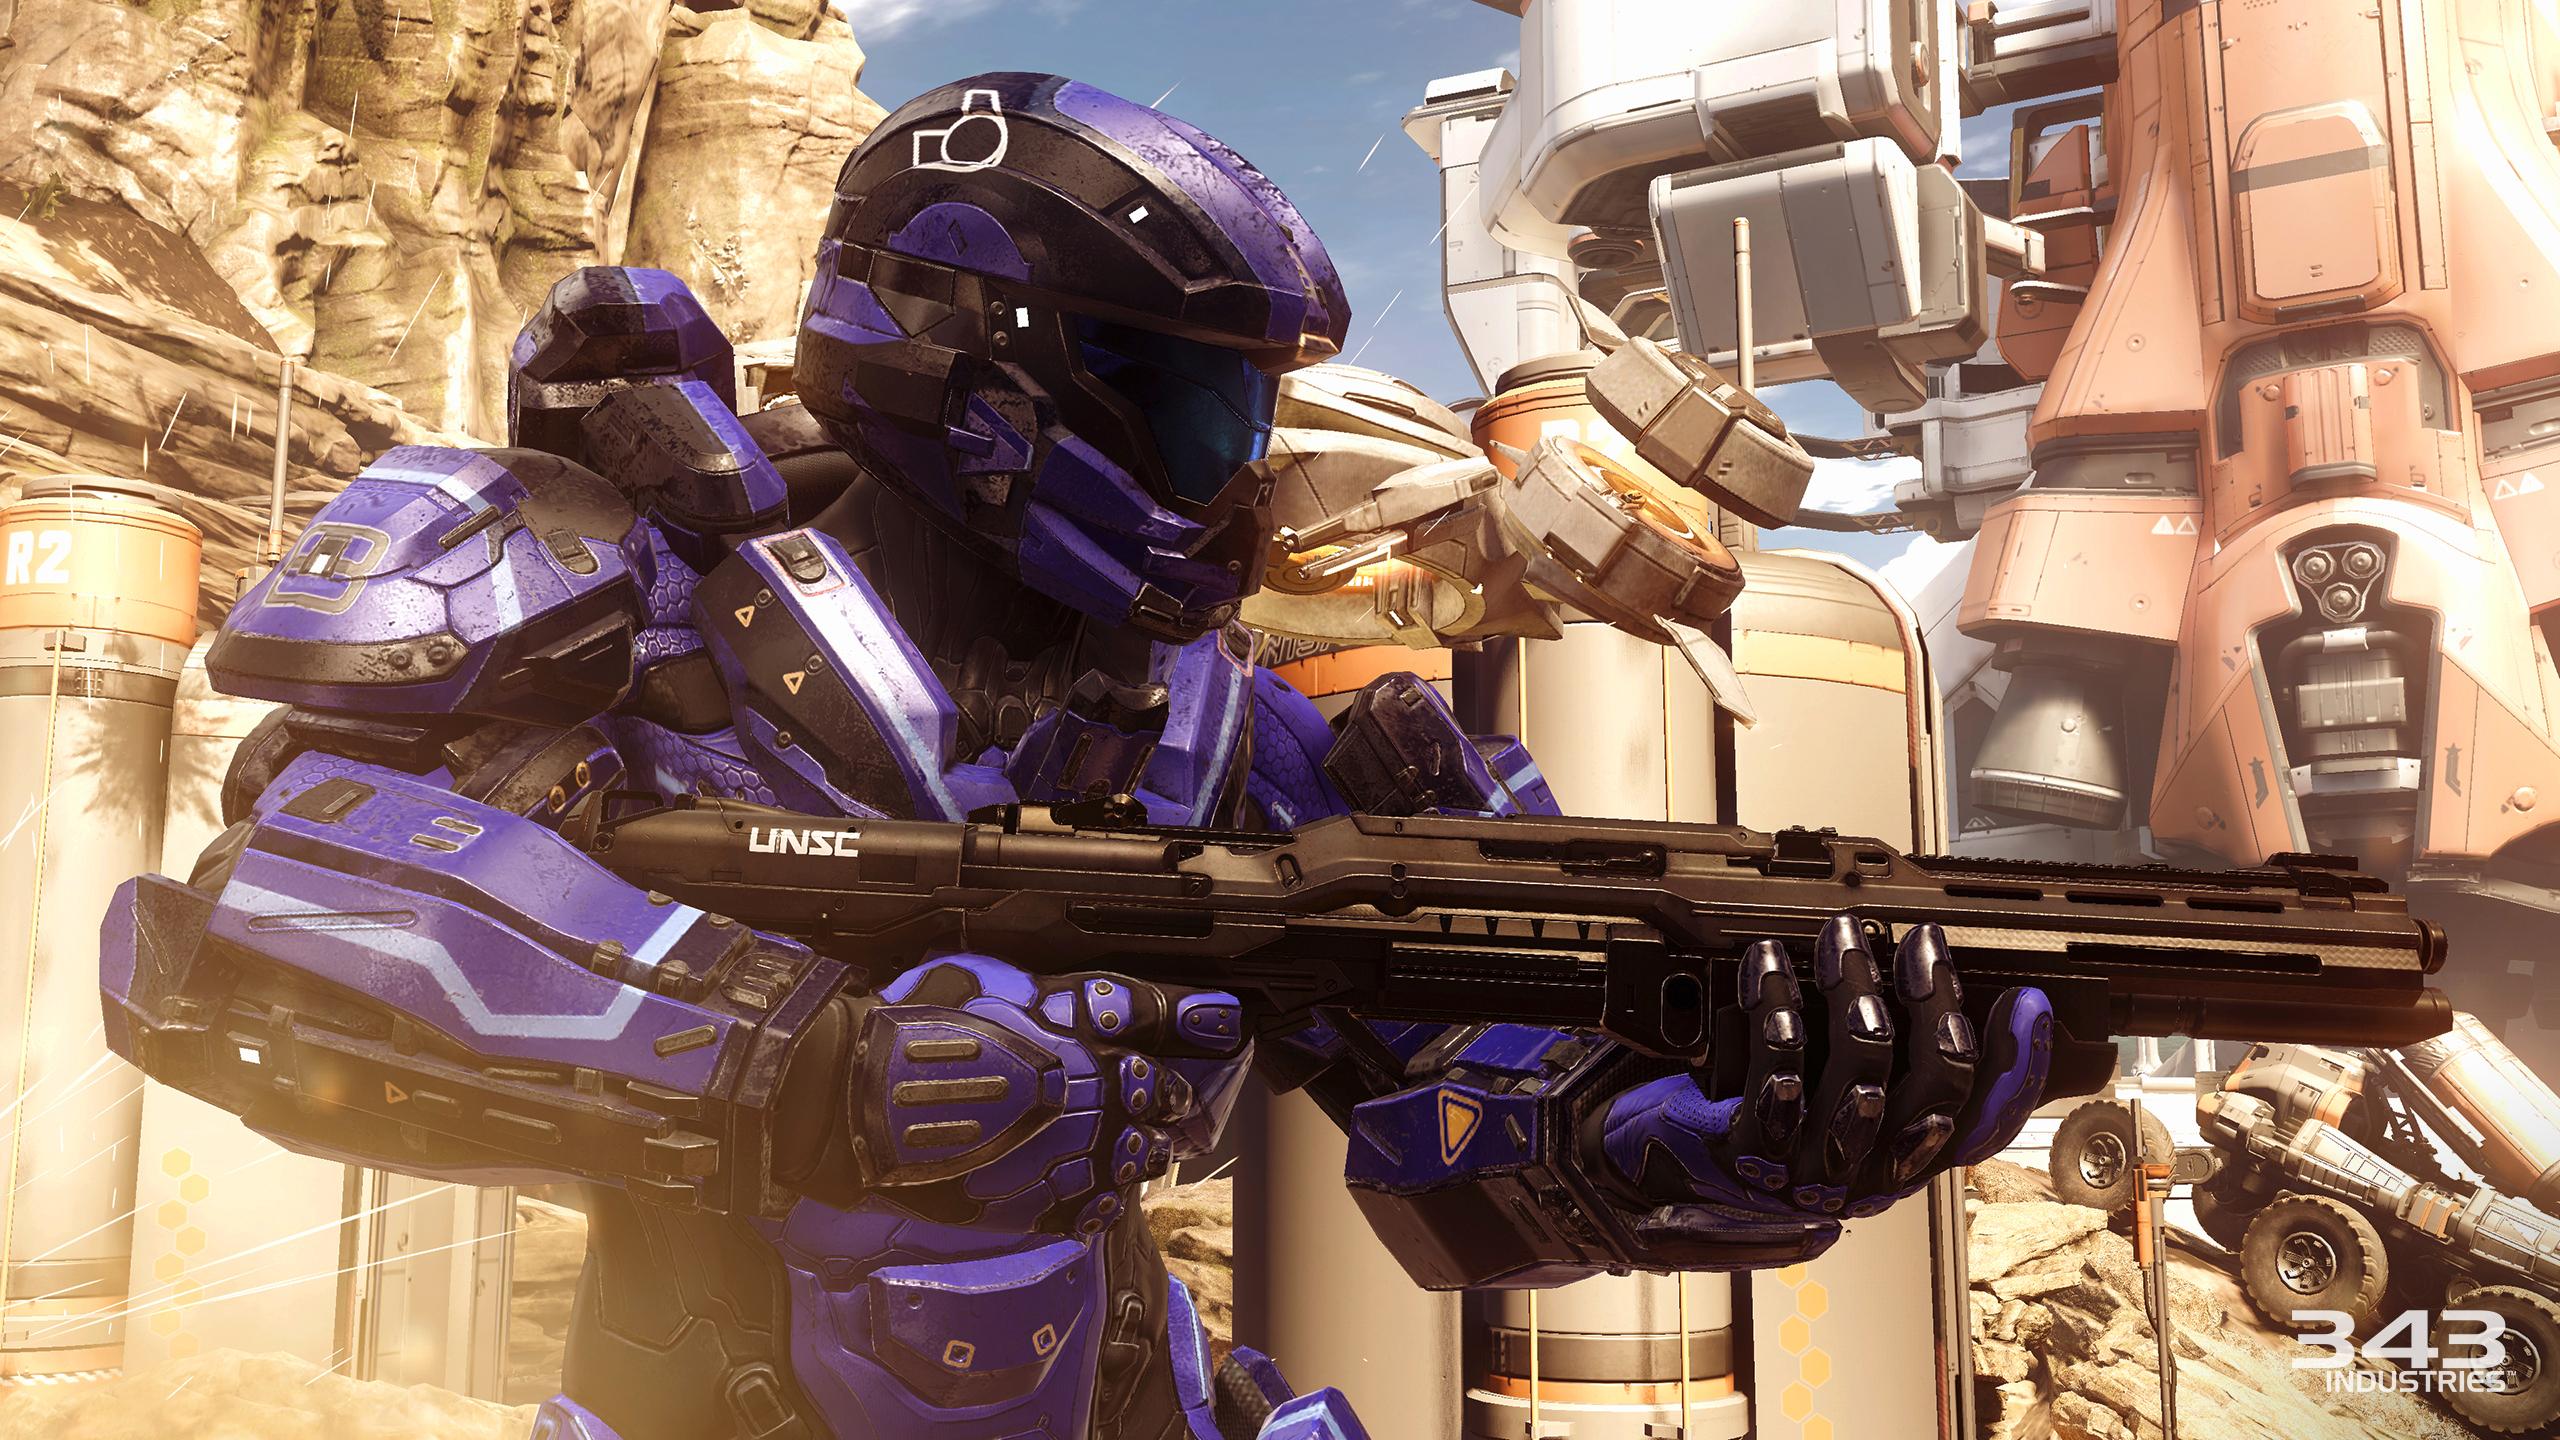 Halo-5-Guardians_2015_08-04-15_001